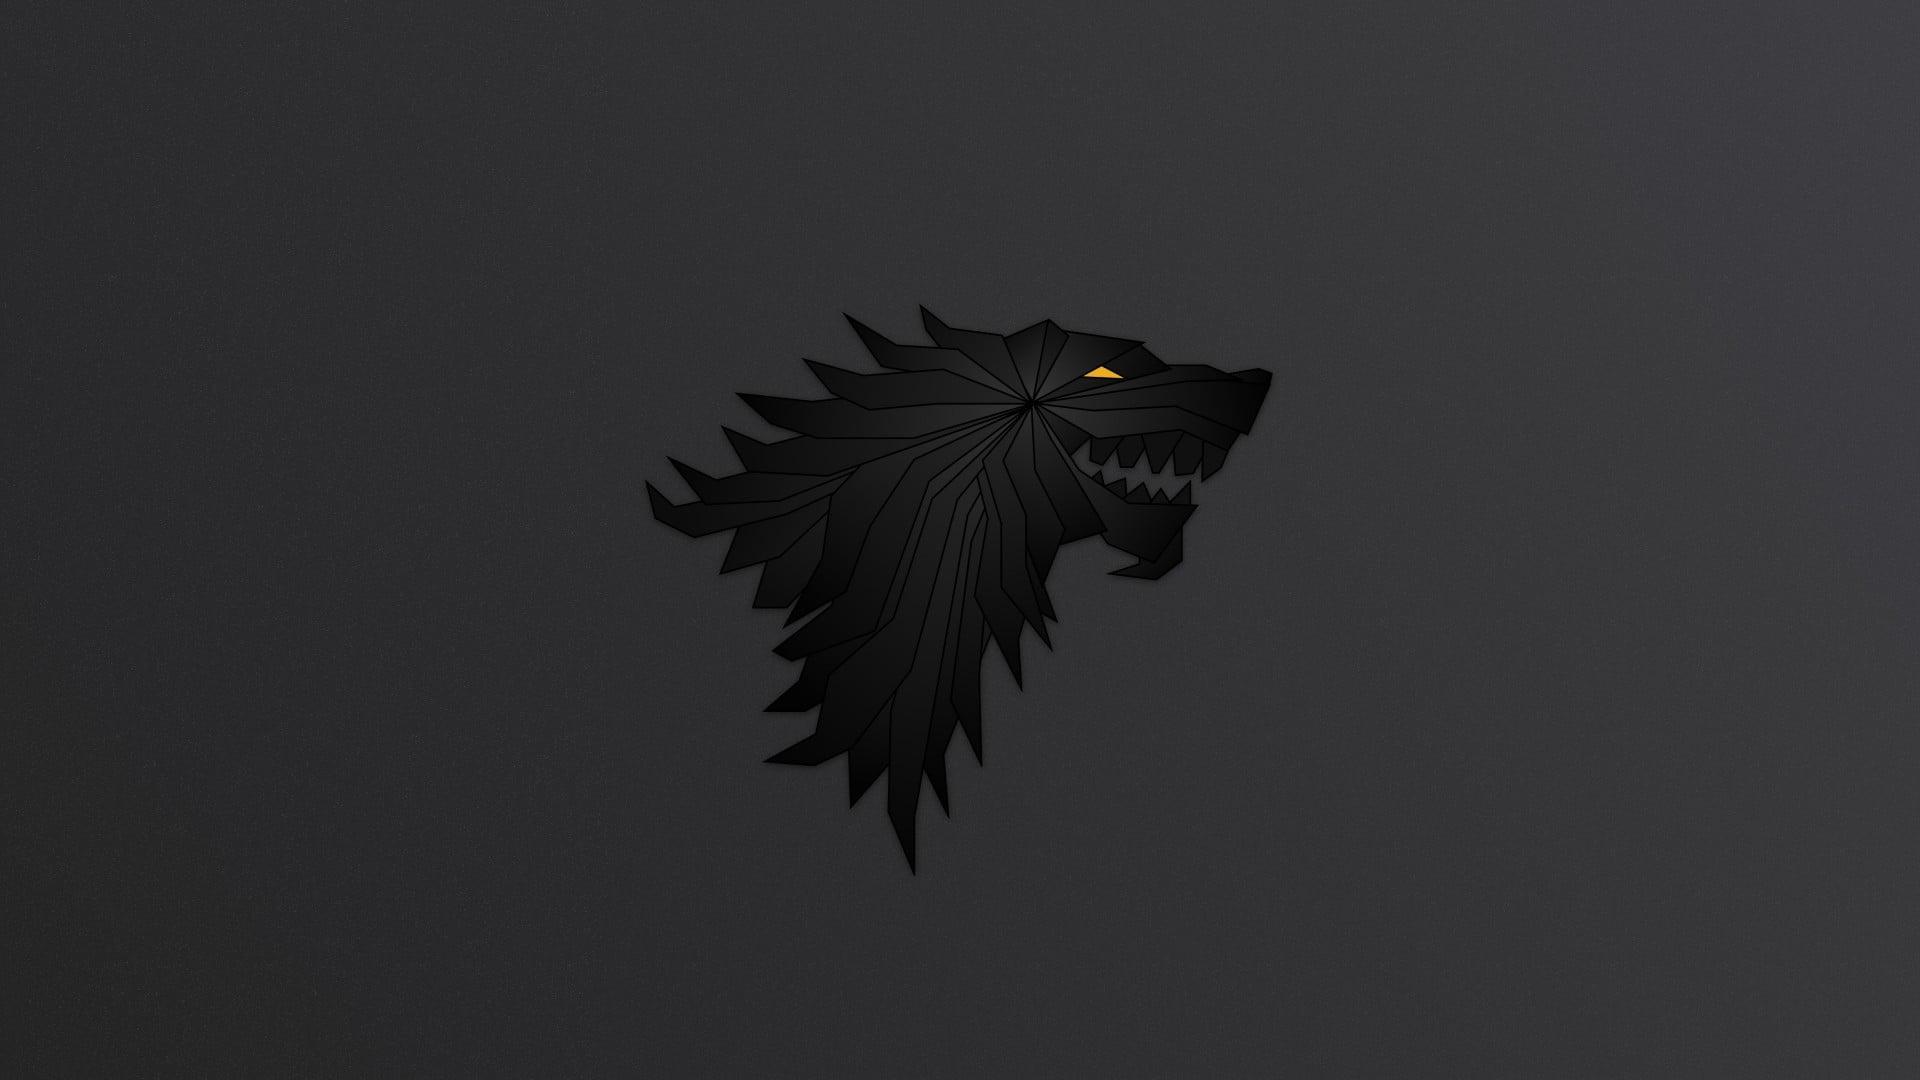 Stark Logo Wallpapers Wallpaper Cave